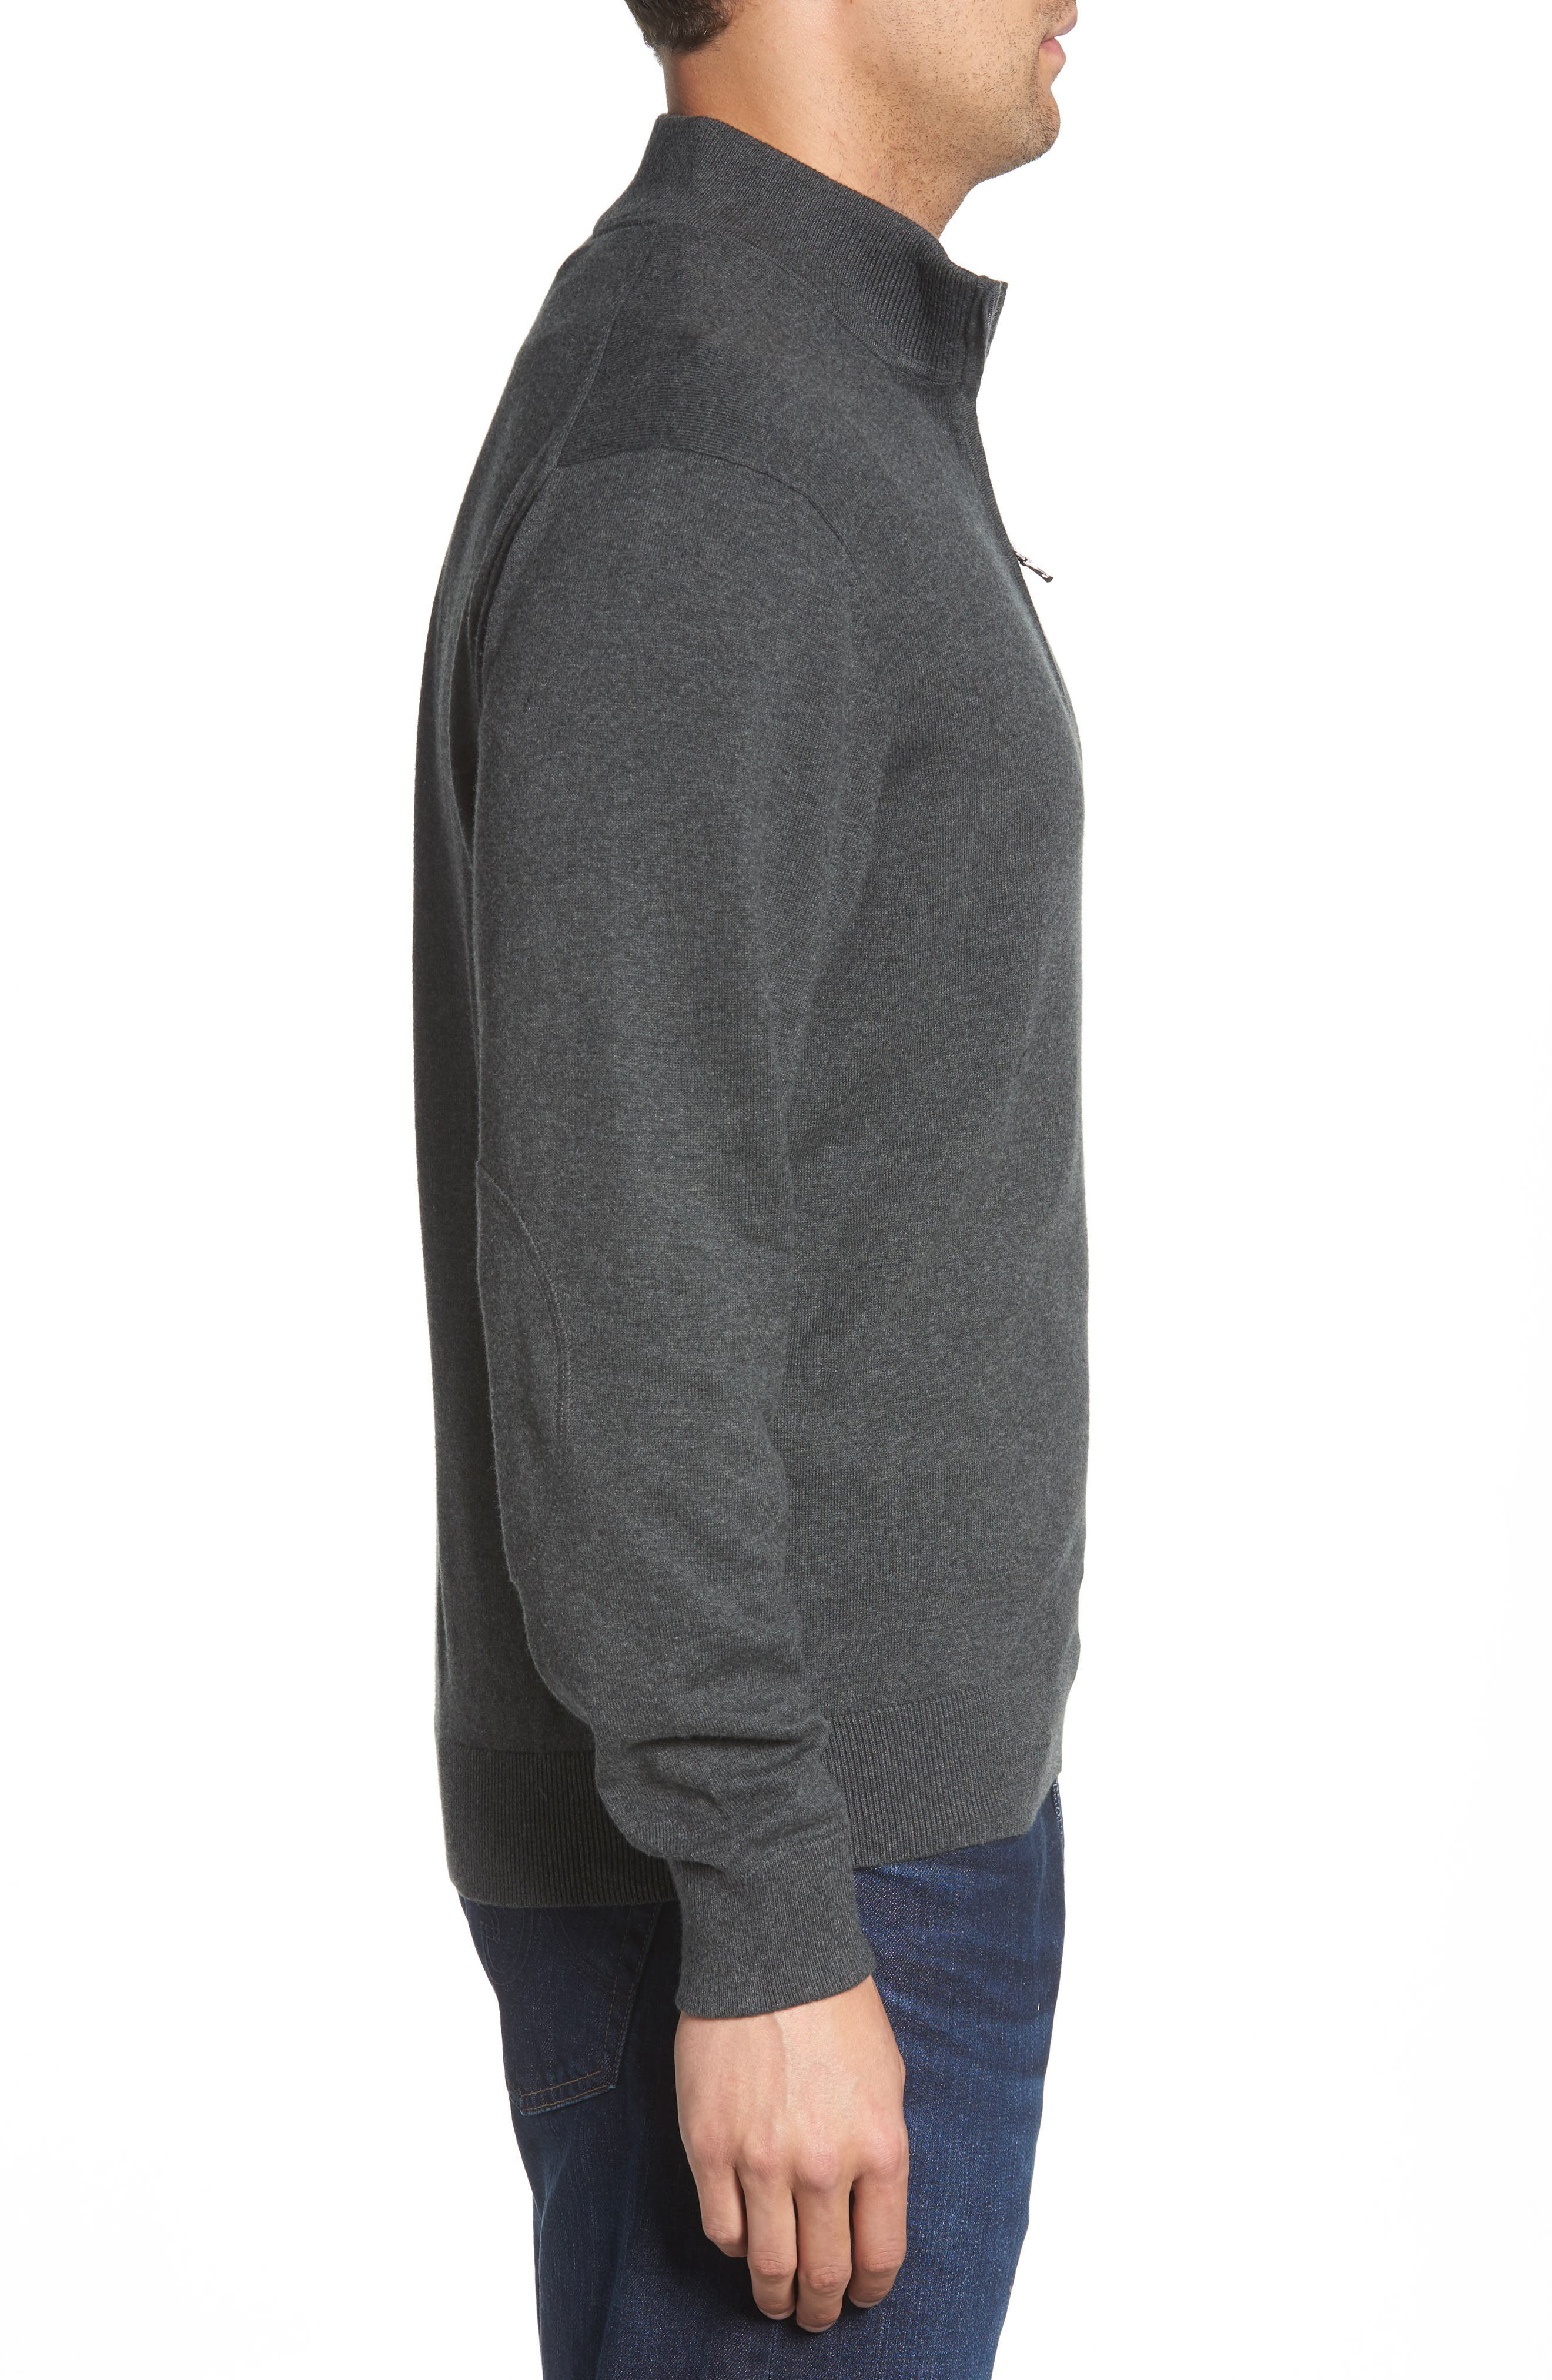 Seattle Seahawks - Lakemont Regular Fit Quarter Zip Sweater,                             Alternate thumbnail 3, color,                             CHARCOAL HEATHER